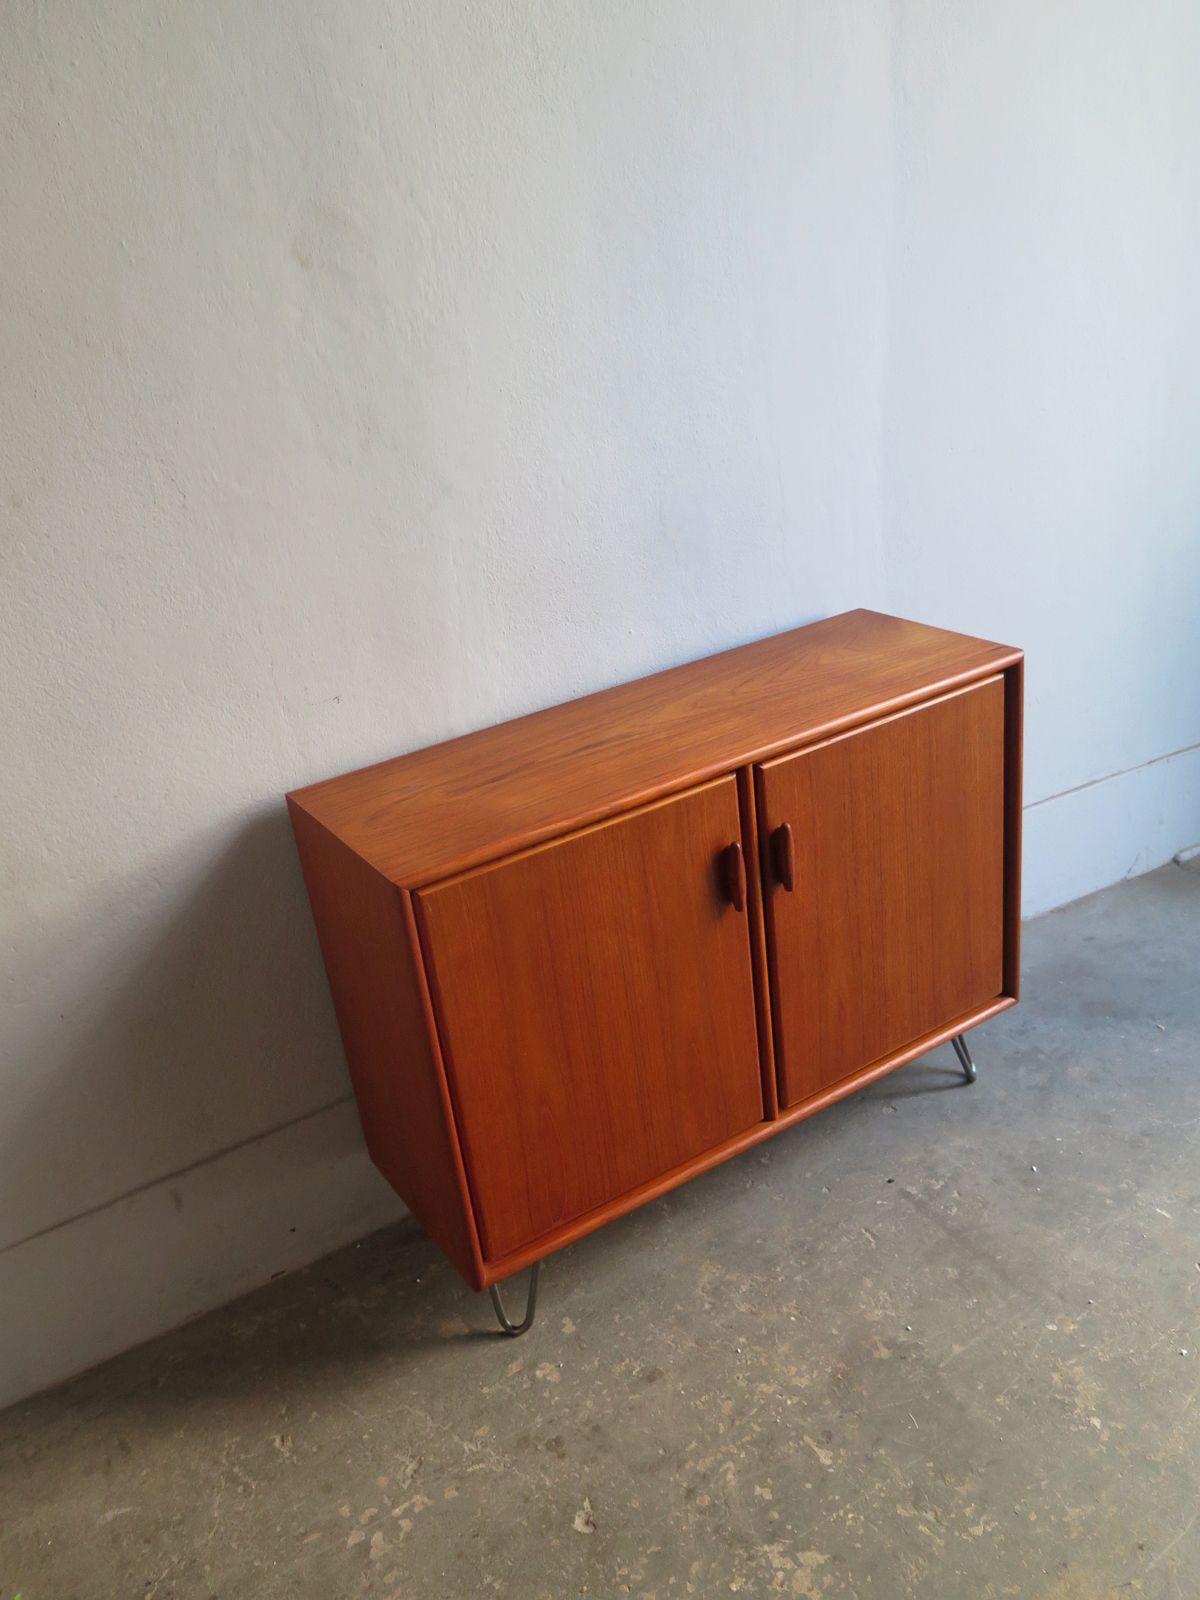 Vintage Furniture With Metal Feet 1960s Design Market